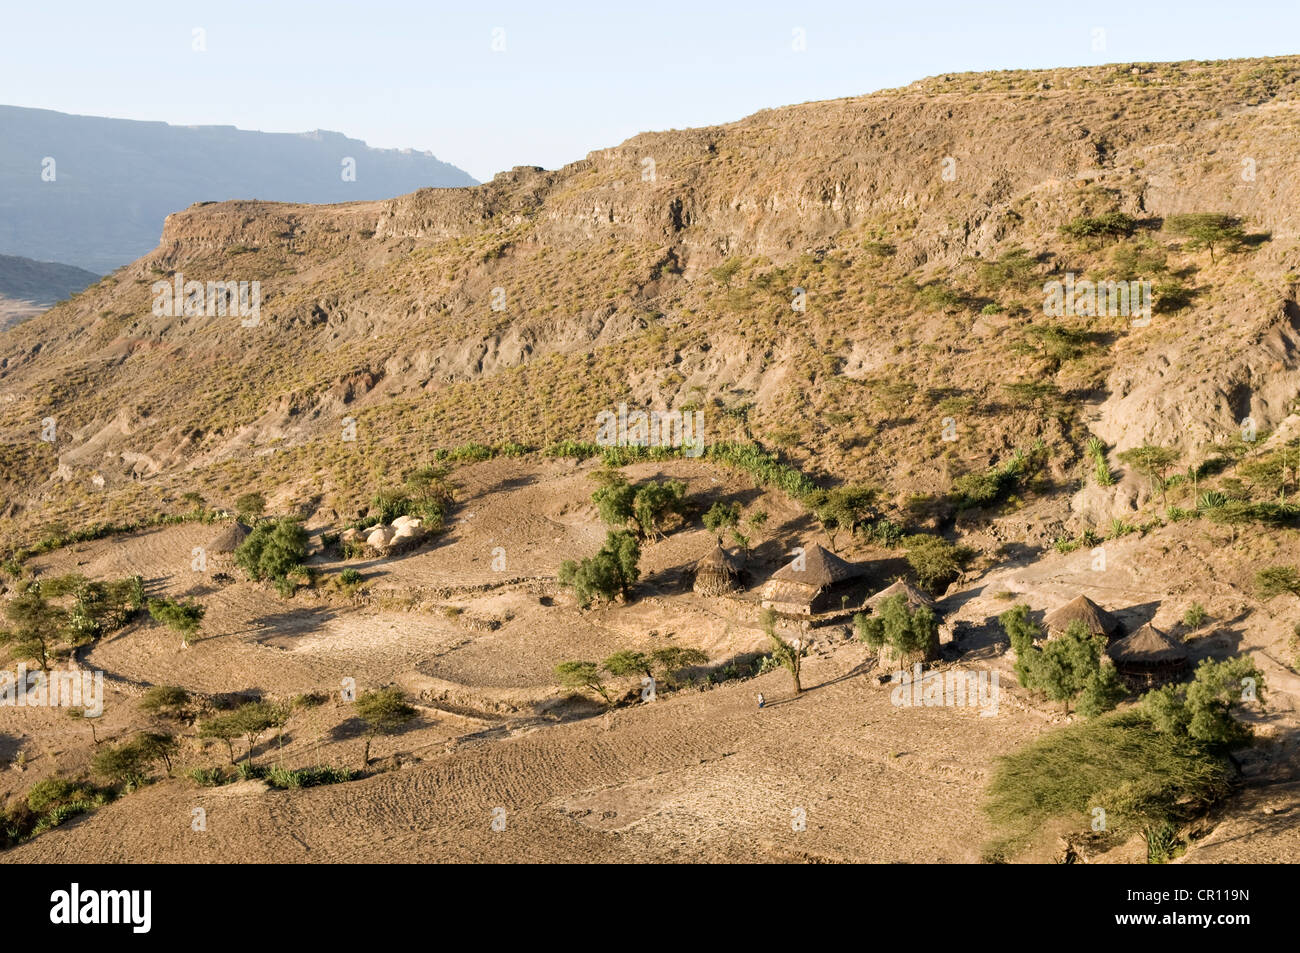 Ethiopia, Amhara Region, Surroundings of Lalibela - Stock Image